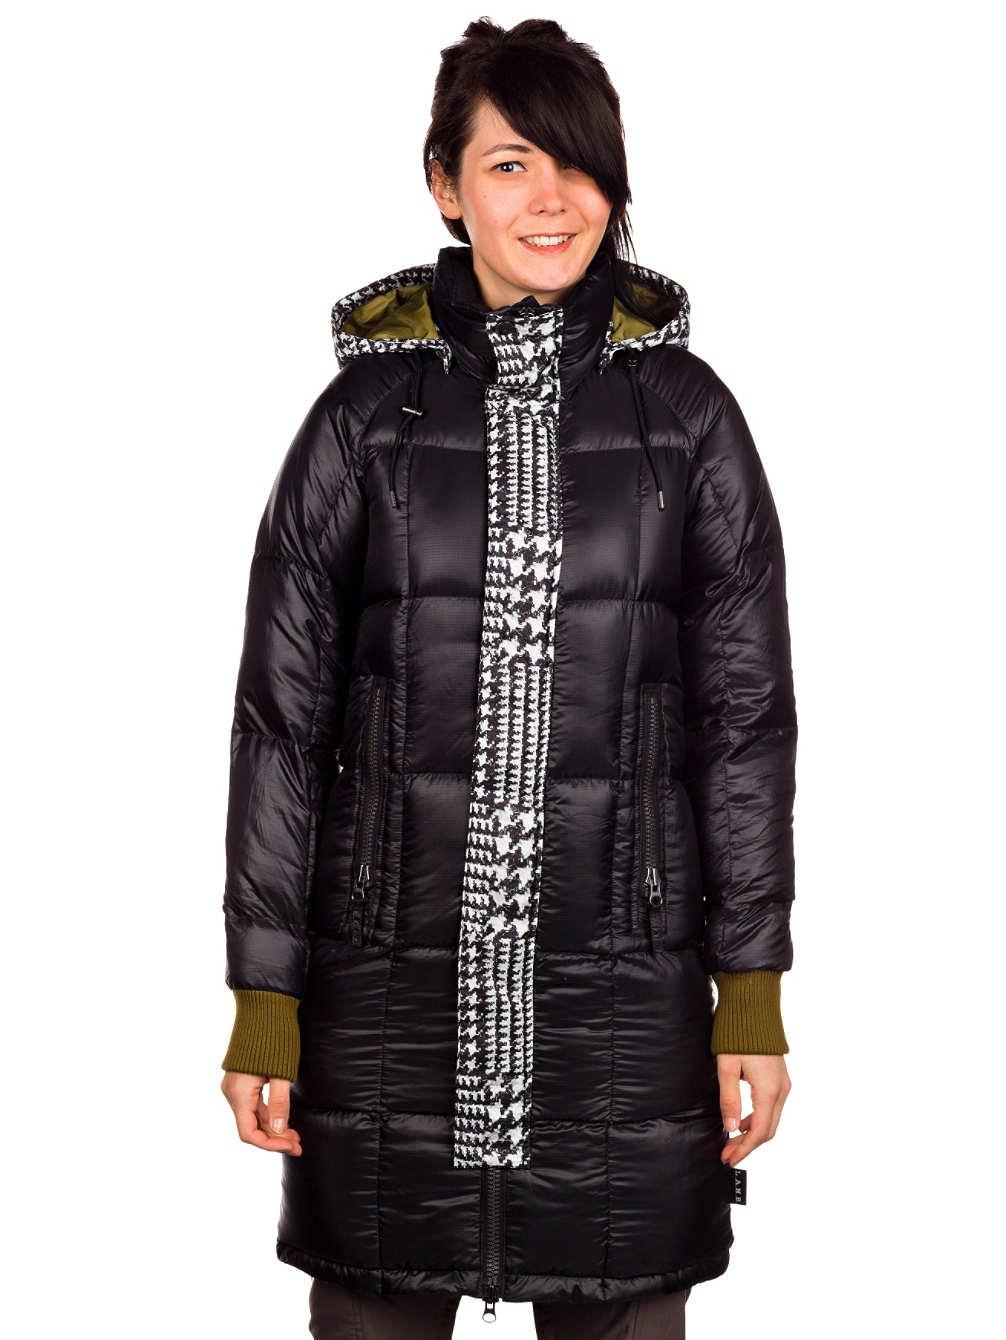 burton woman lainsulator jacket 2014 g nstig online kaufen. Black Bedroom Furniture Sets. Home Design Ideas